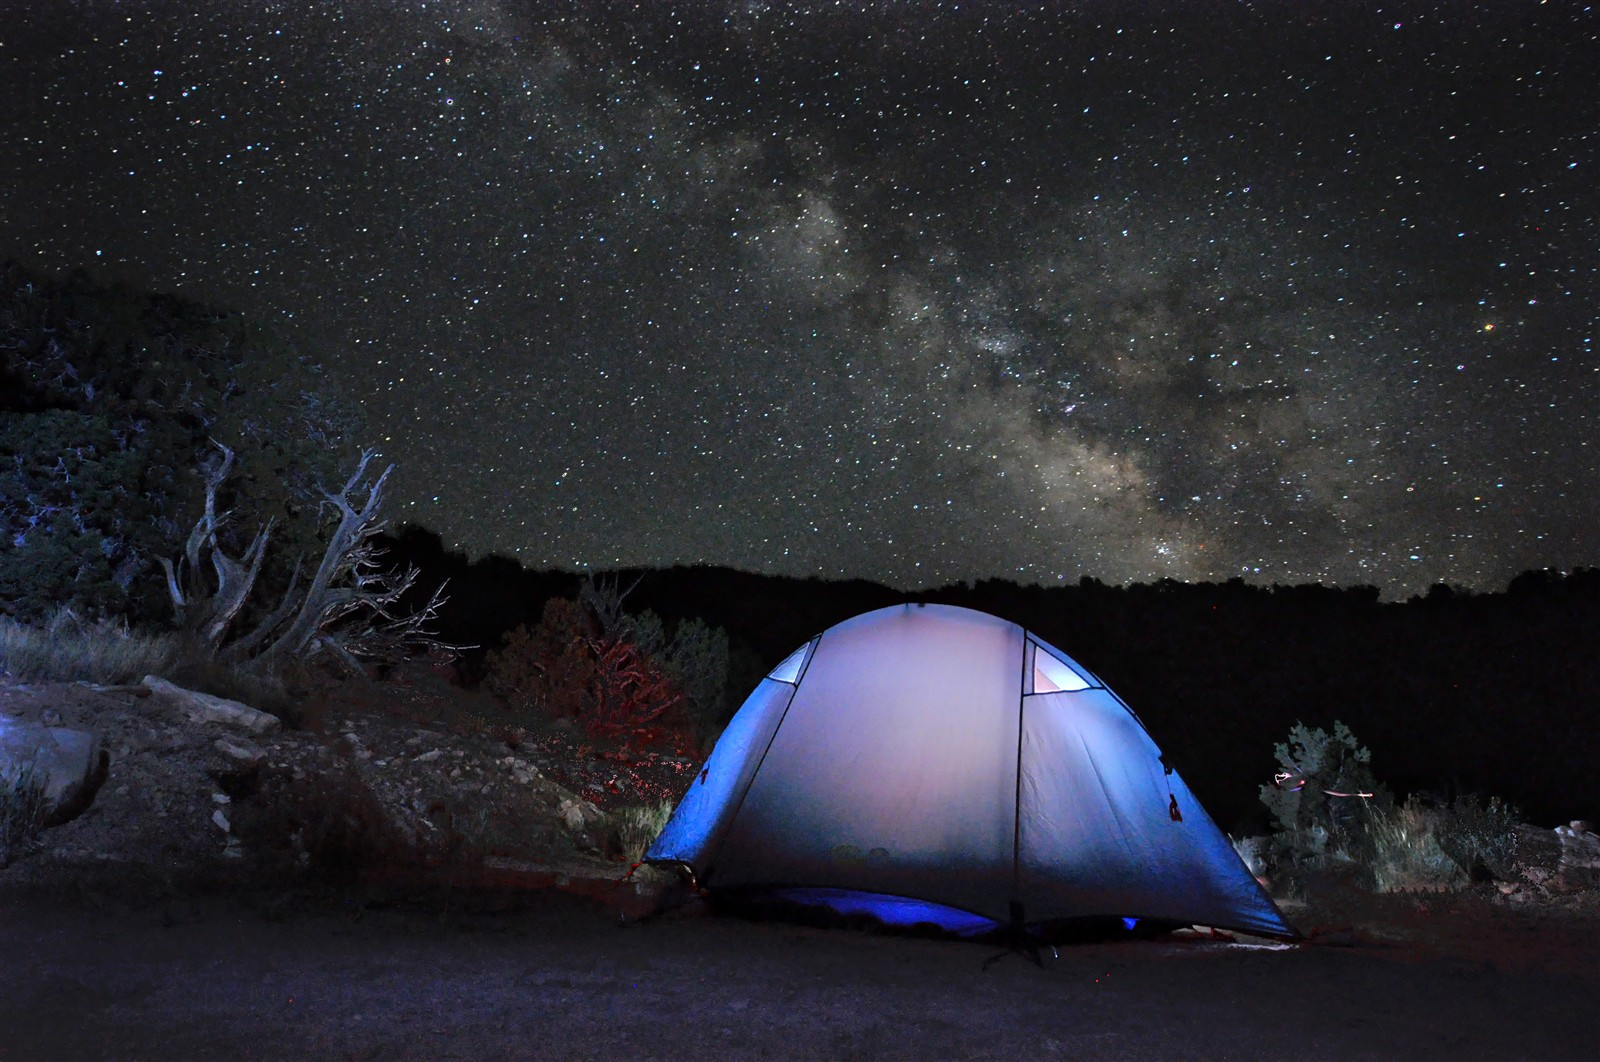 night tent HDR: Crankybob: Galleries: Digital Photography ...